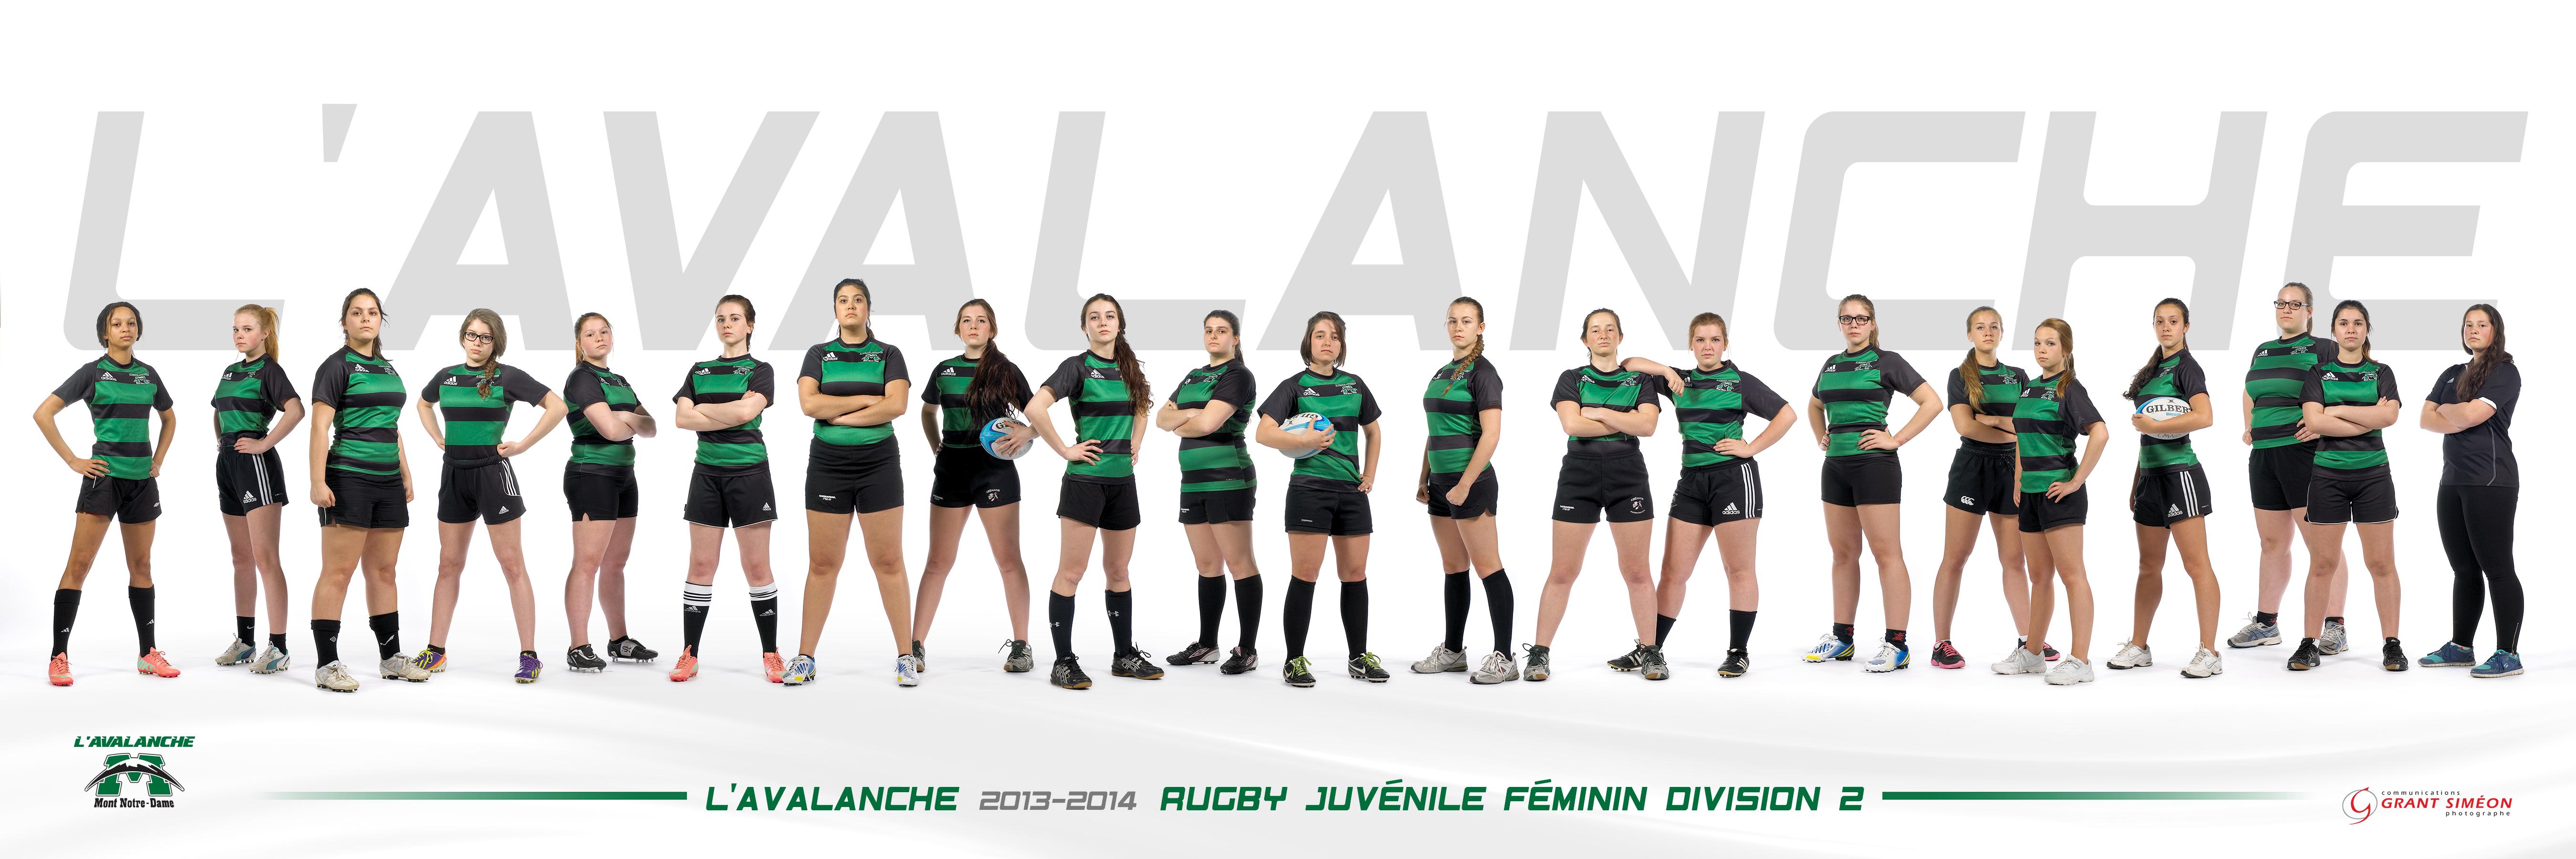 CMND_2013-2014-rugby-juvenile_DIV-2